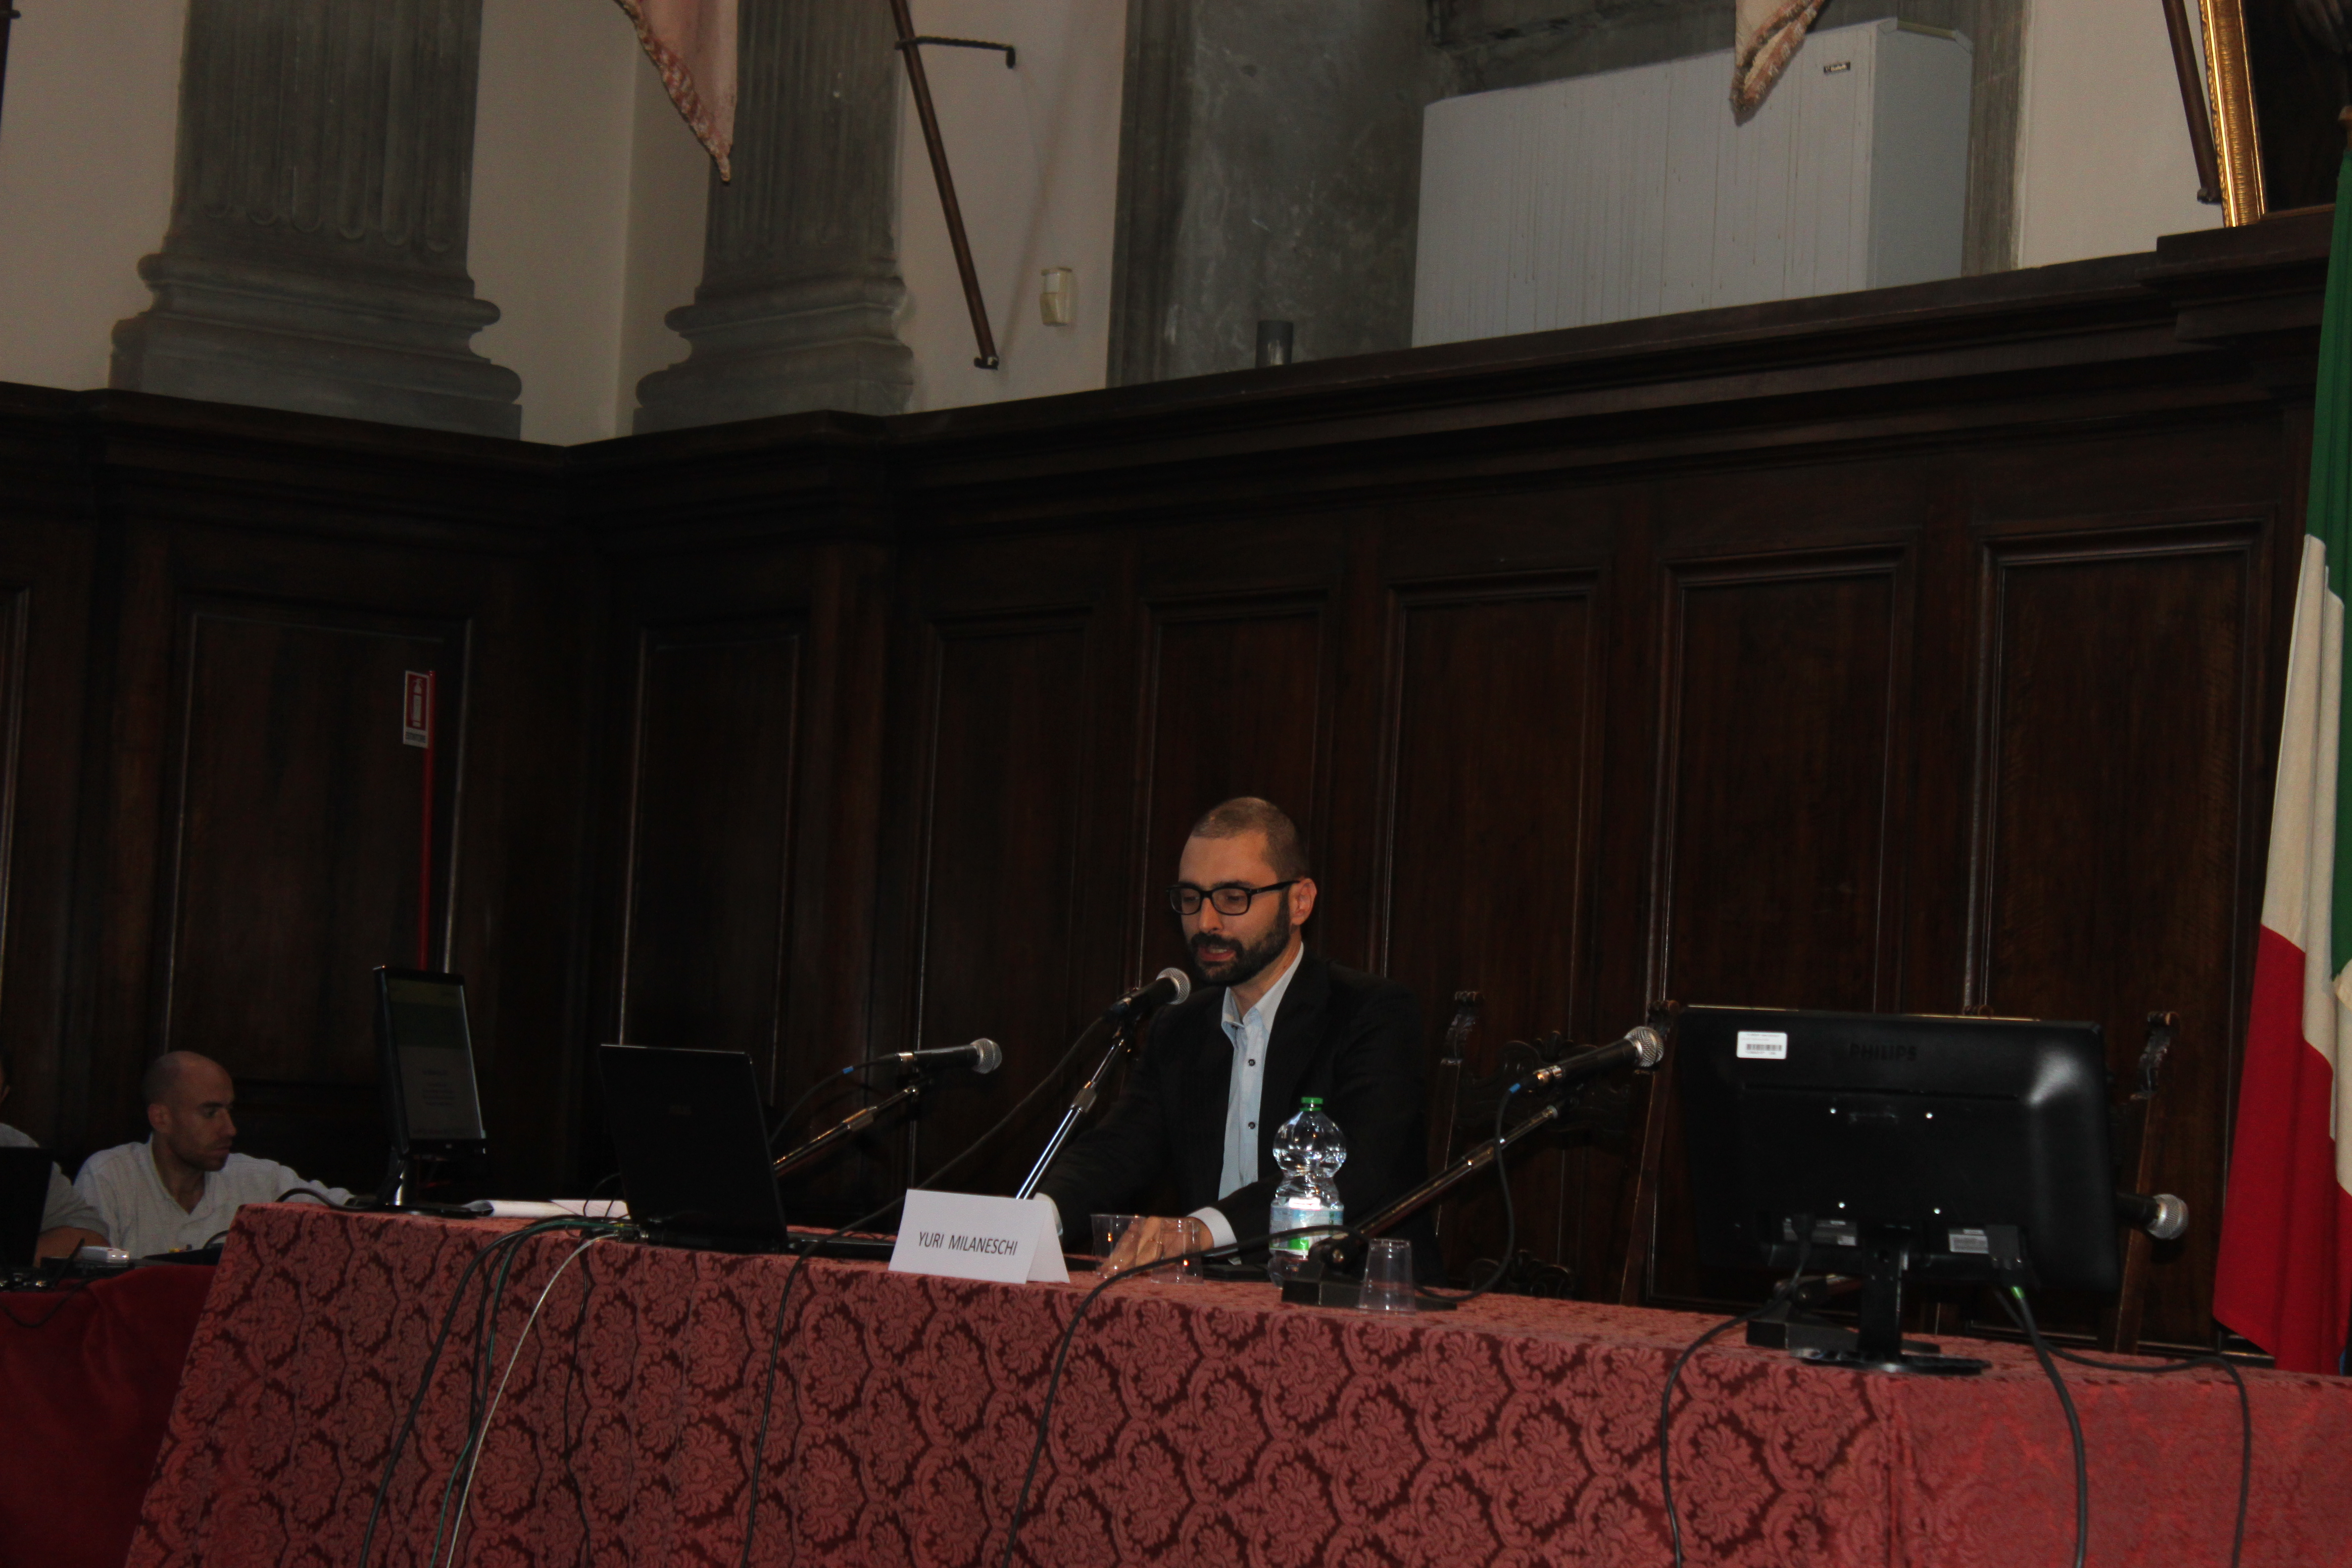 Importanti studi del ricercatore savinese Yuri Milaneschi